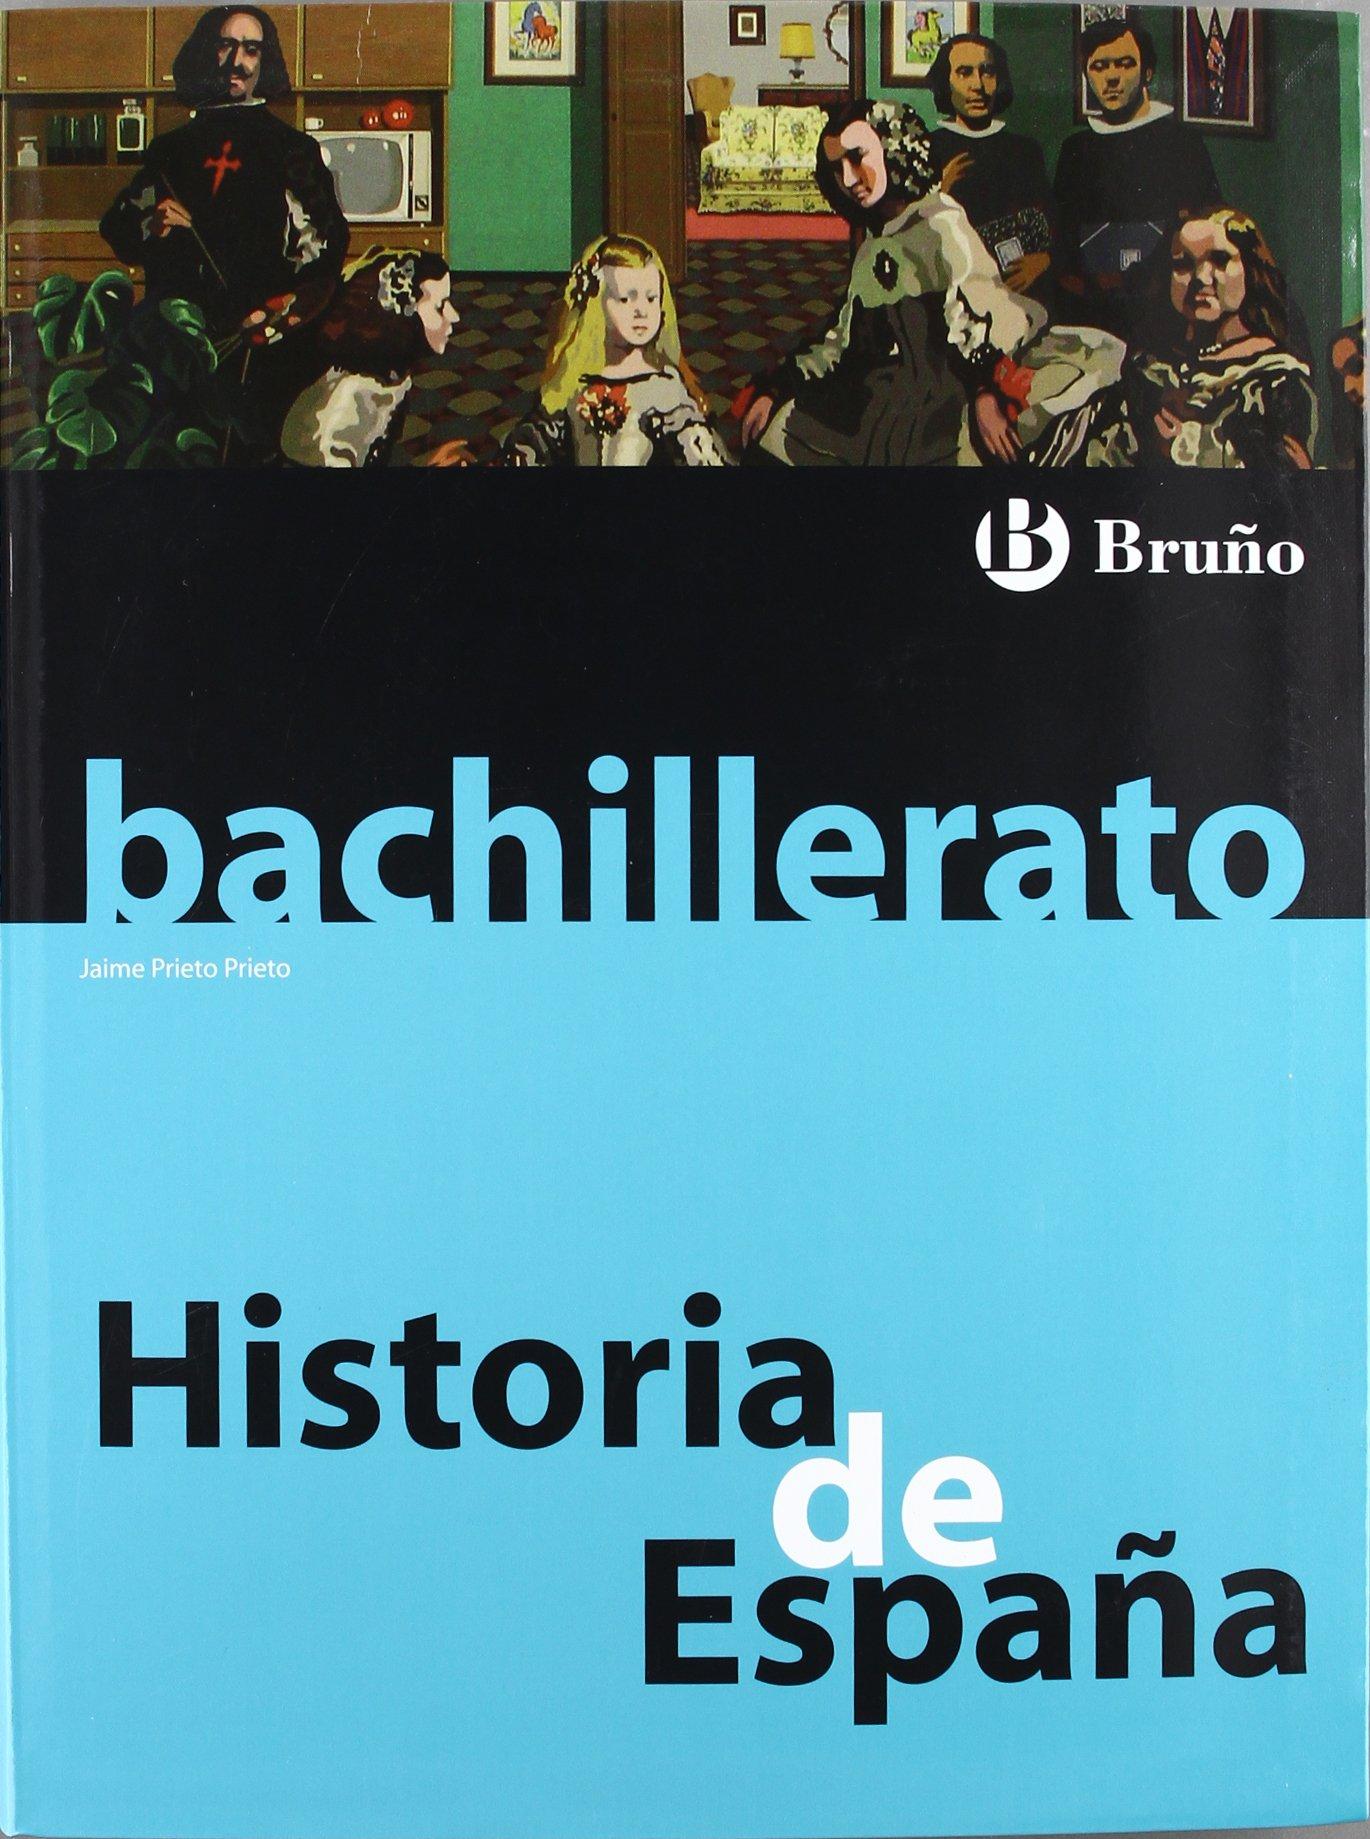 Historia de España Bachillerato - 9788421664544: Amazon.es: Prieto Prieto, Jaime: Libros